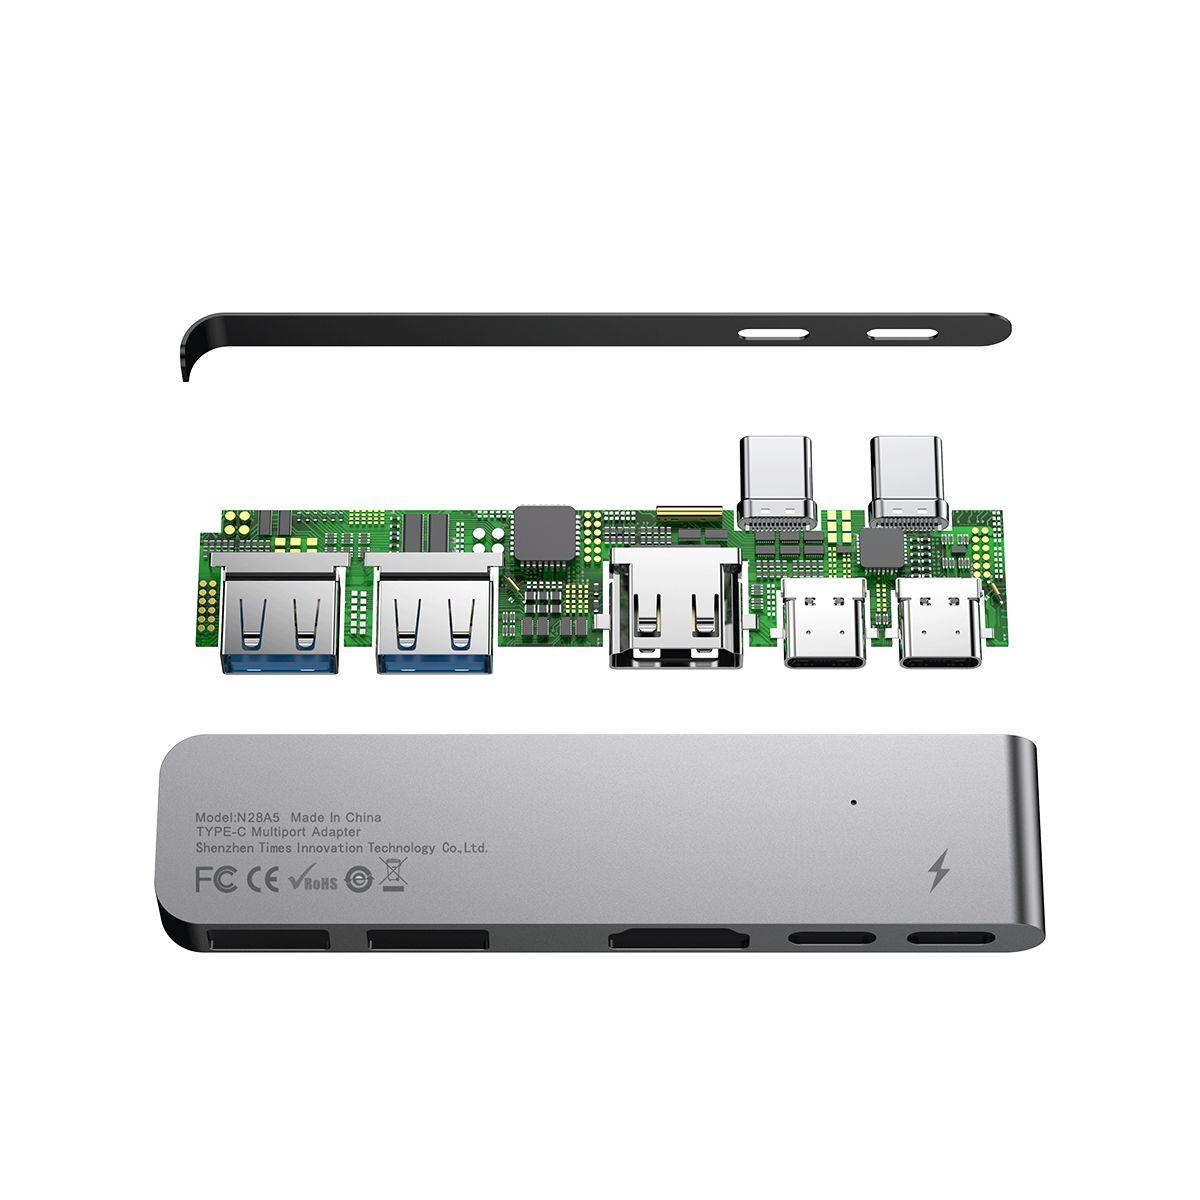 HUB 5n1 Baseus para Macbook Pro 2016/2018 e PC 2 Type-C + HDMI 4K + 2 USB 3.0